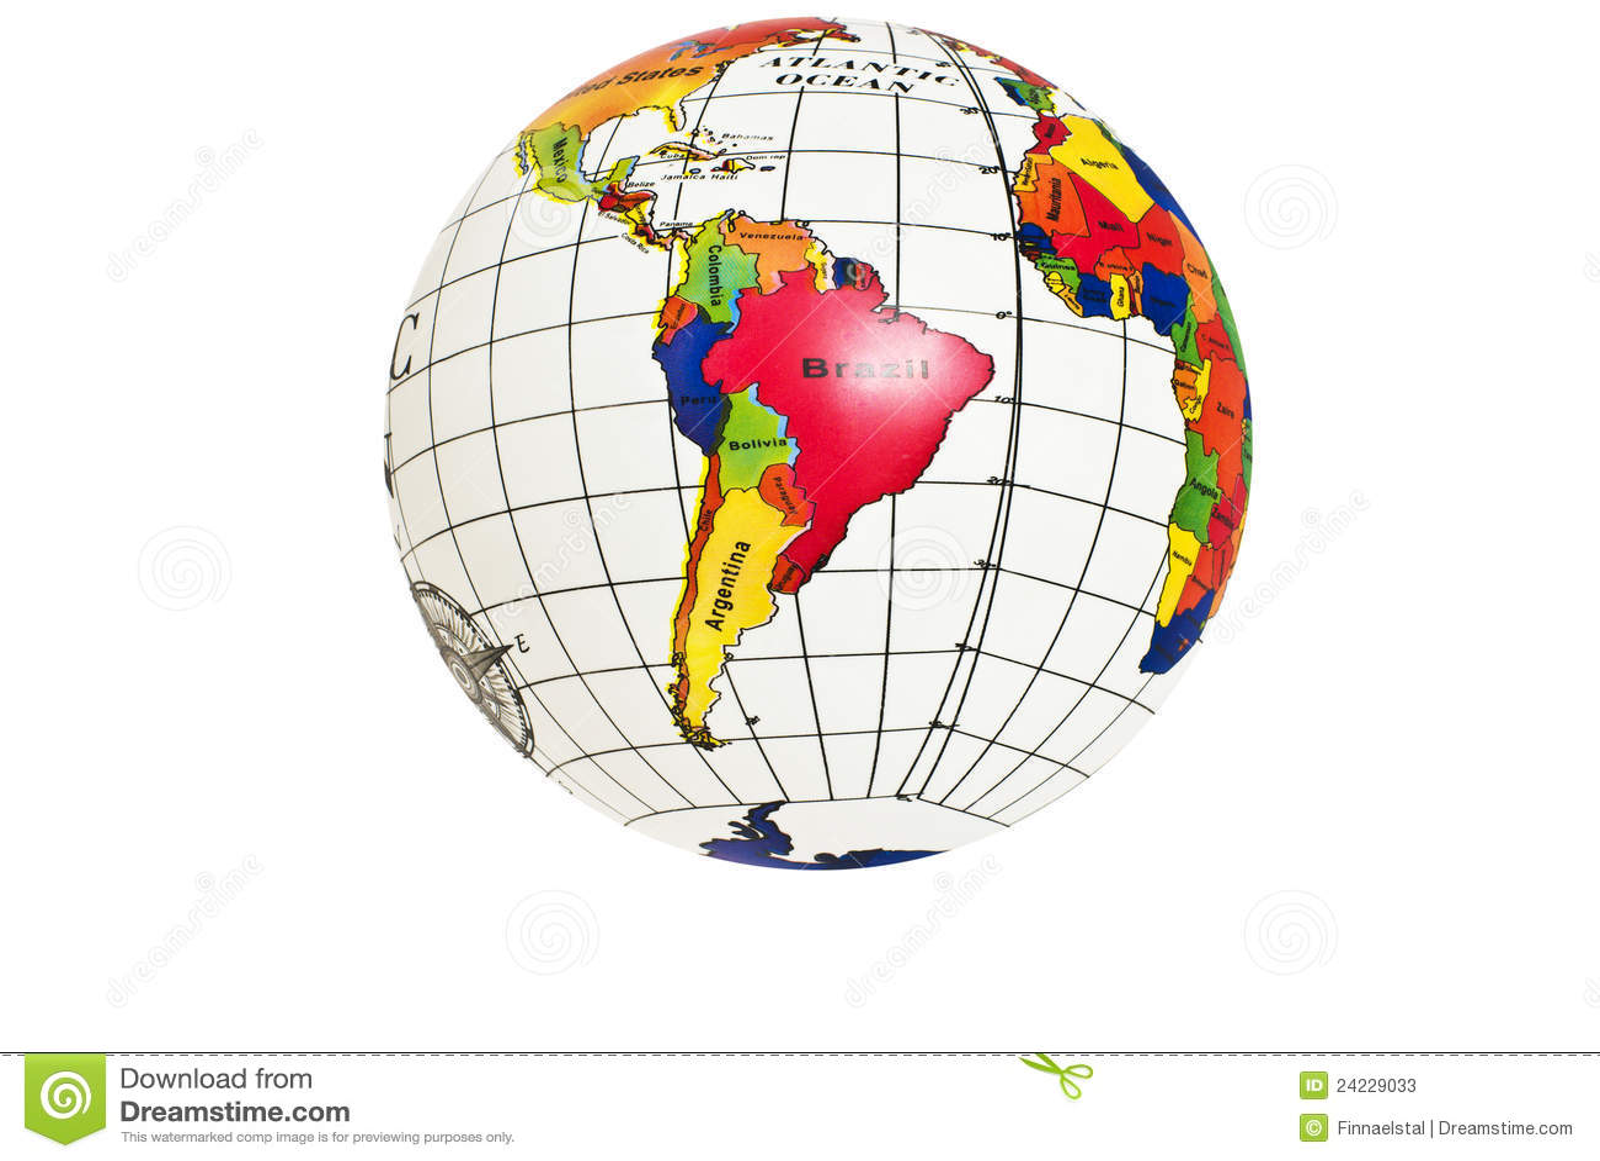 Hemisferio Occidental